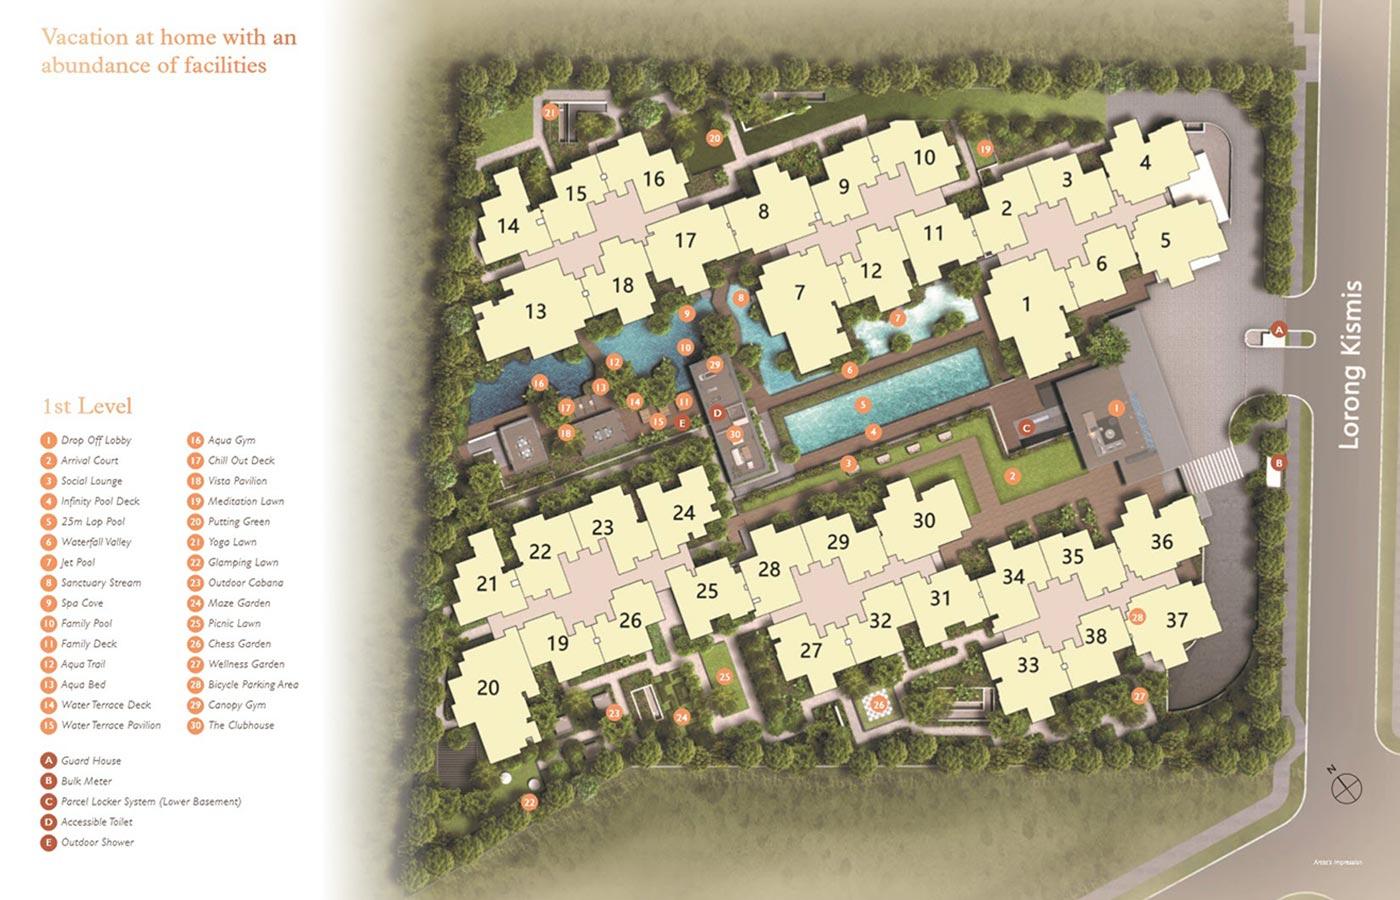 View-at-Kismis-Condo-Site-Plan-1st-Level